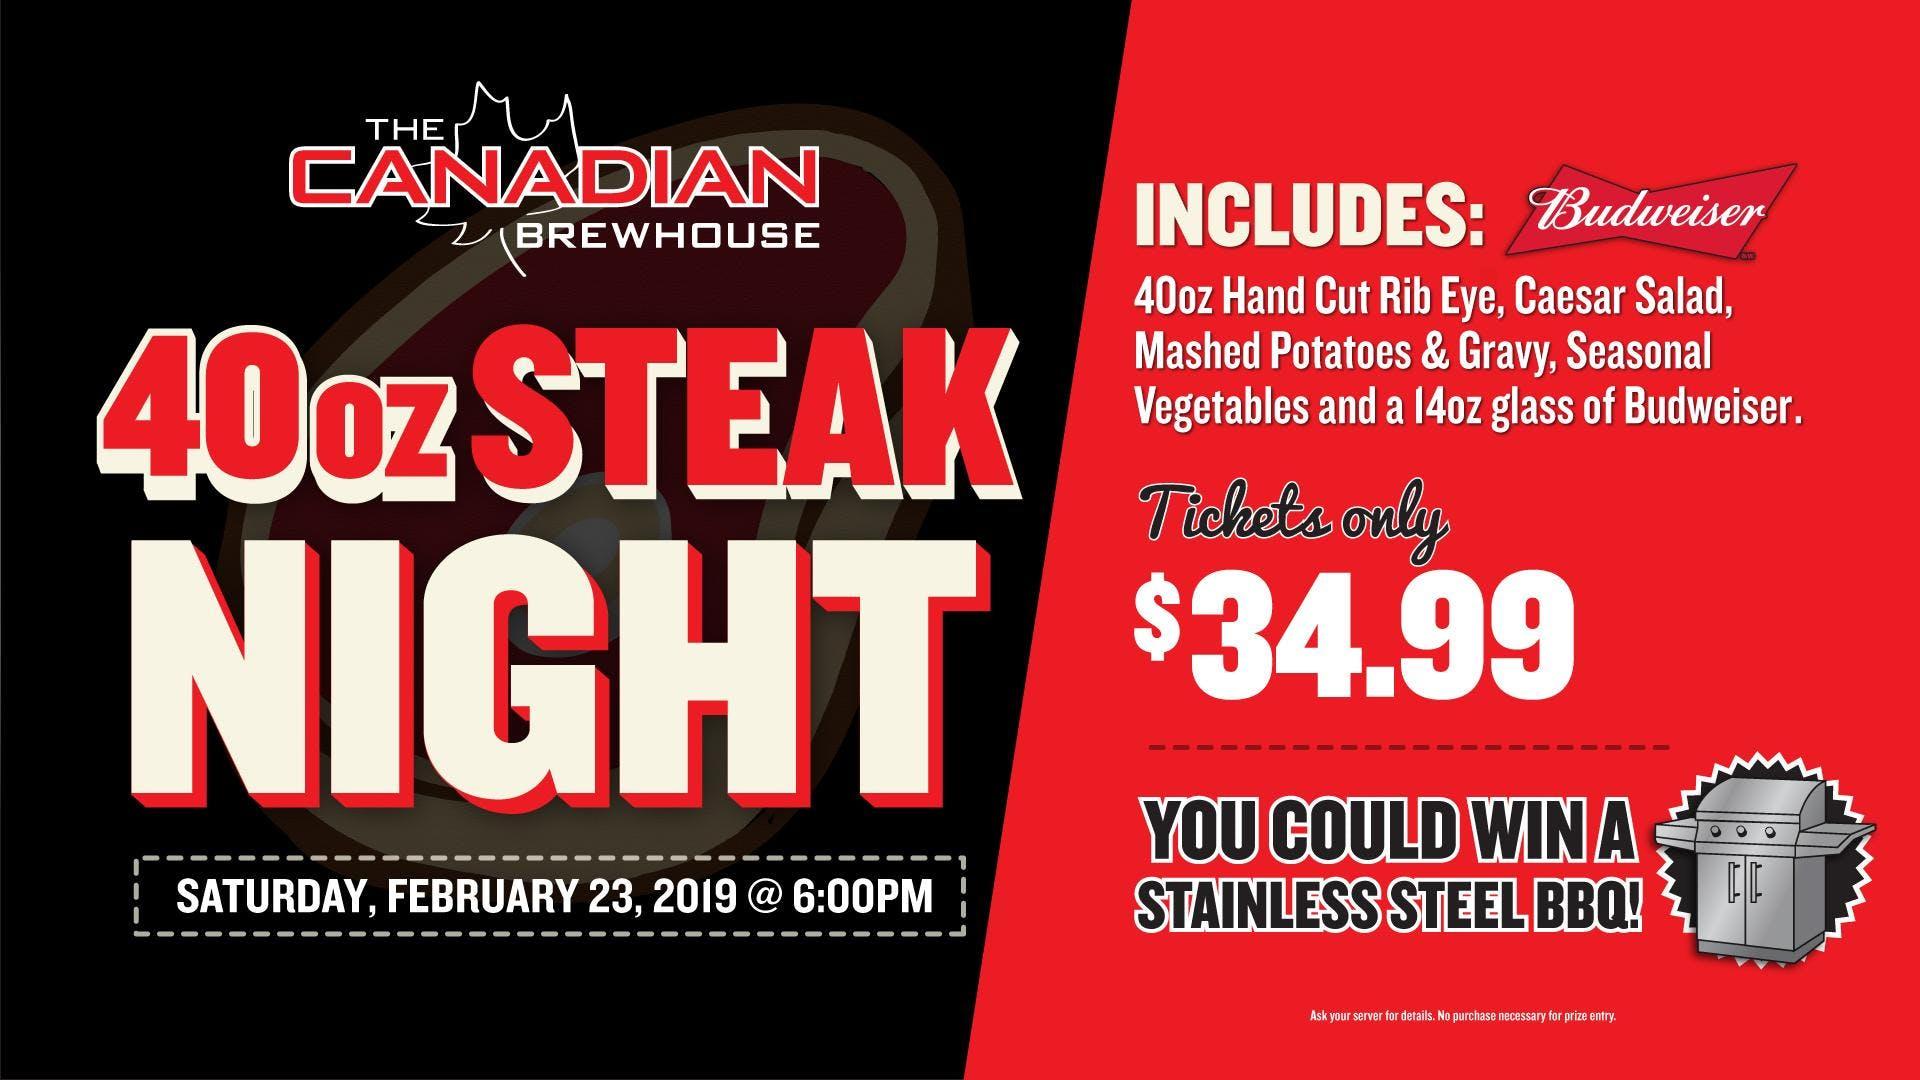 40oz Steak Night (St. Albert South)